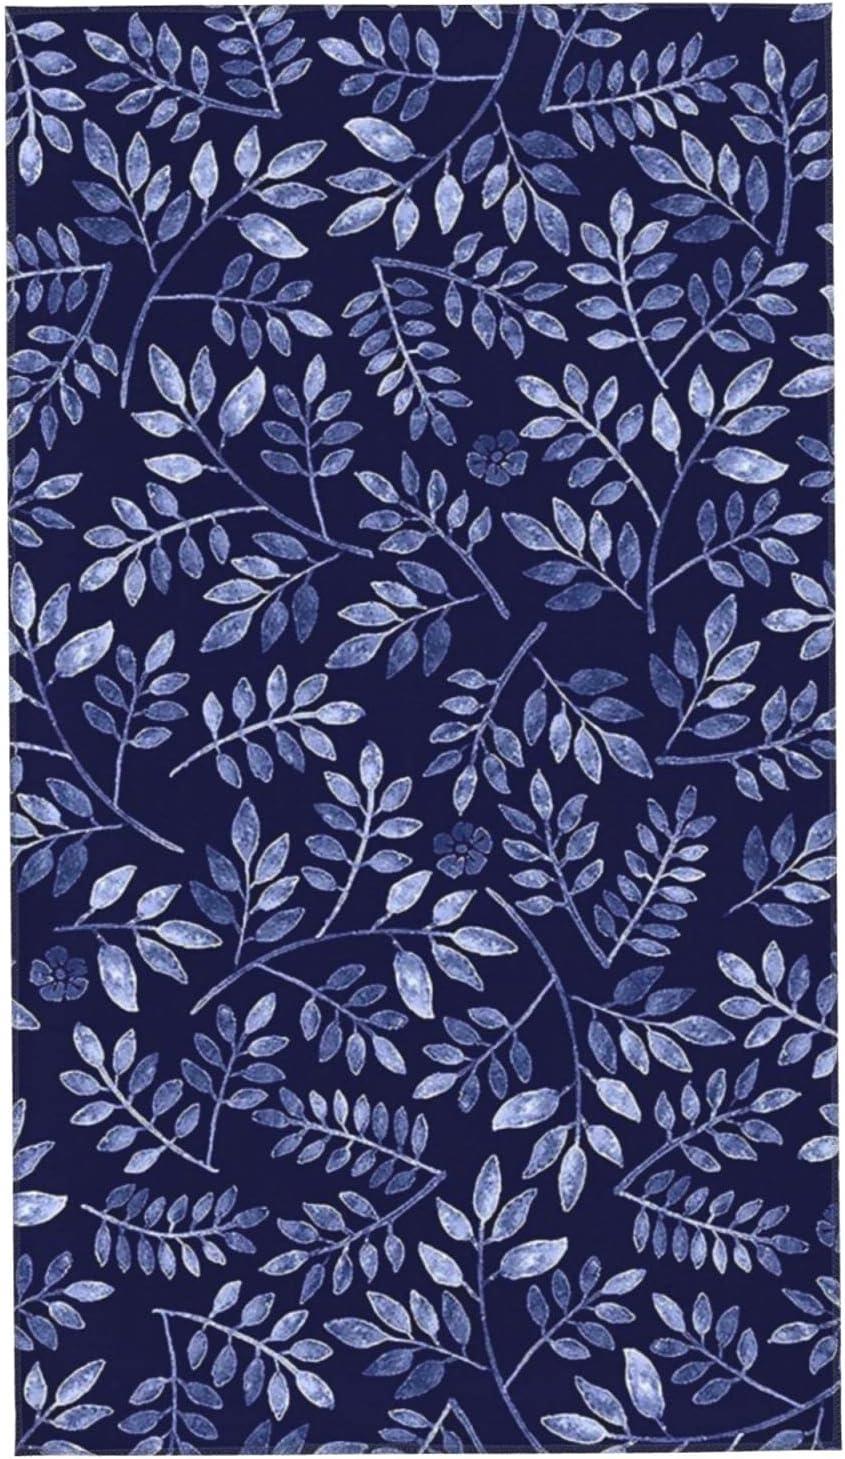 Starballest Superfine 5 ☆ very popular Fiber Absorbent Towel Art Ranking TOP16 Leaves Soft Pri